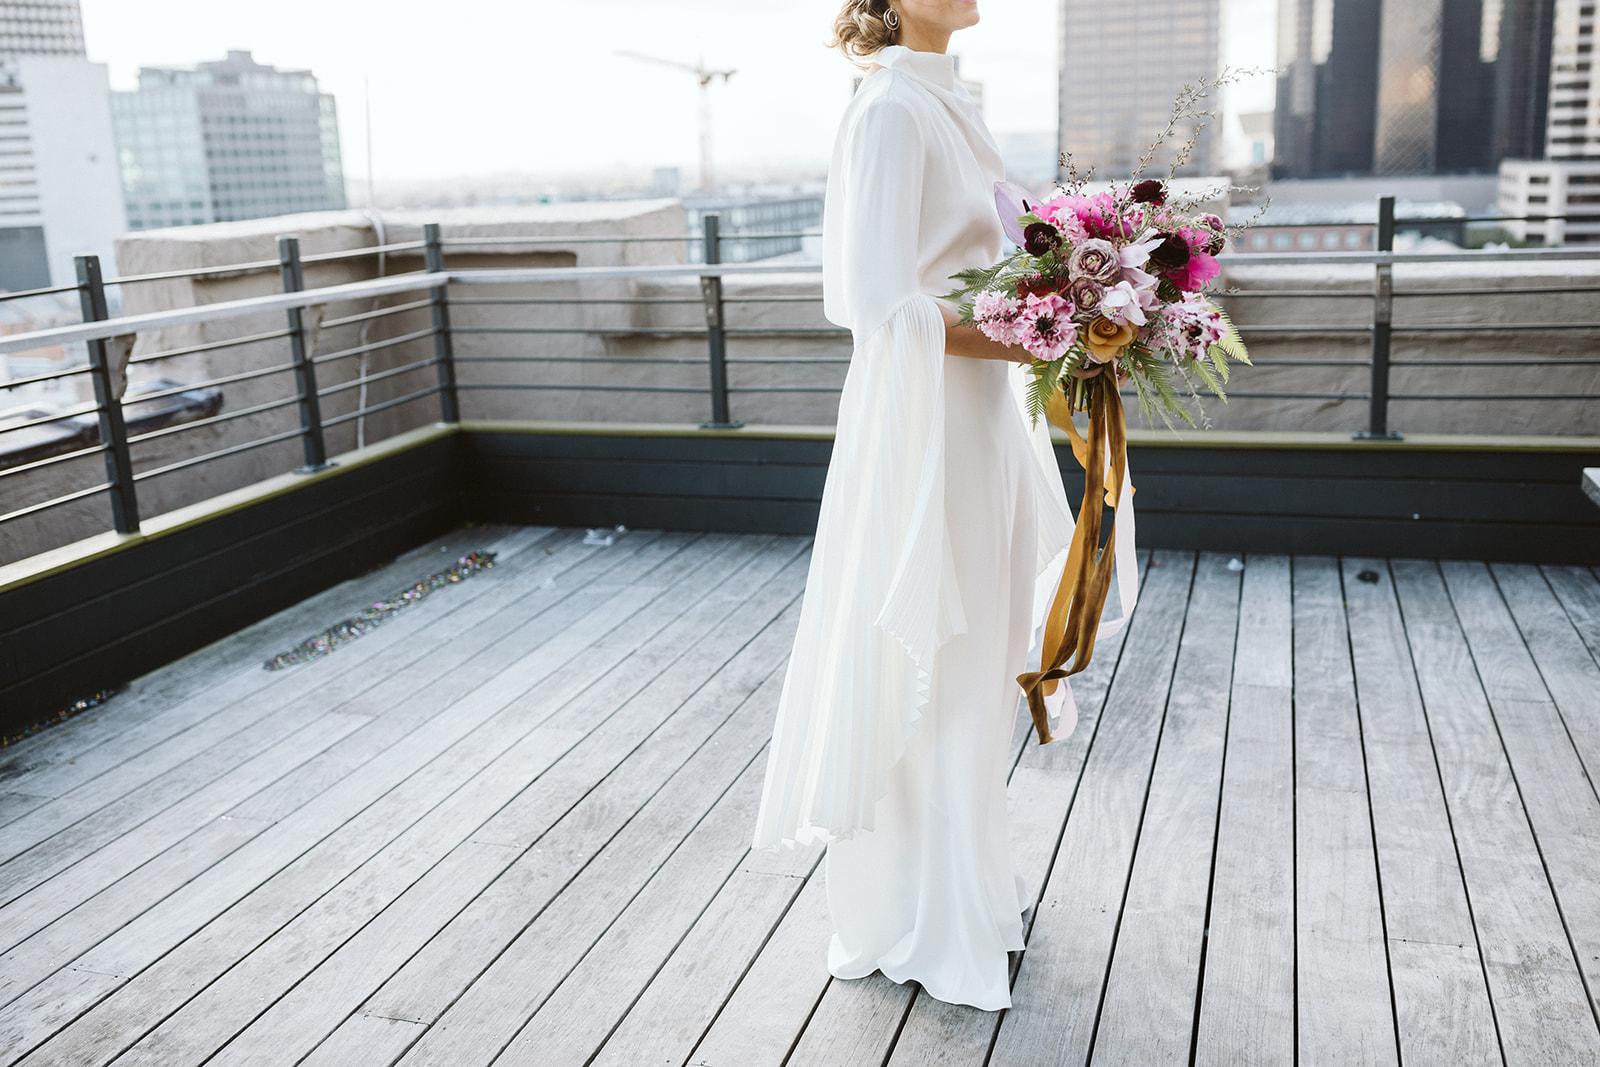 sean_shannon_wedding-160_websize.jpg